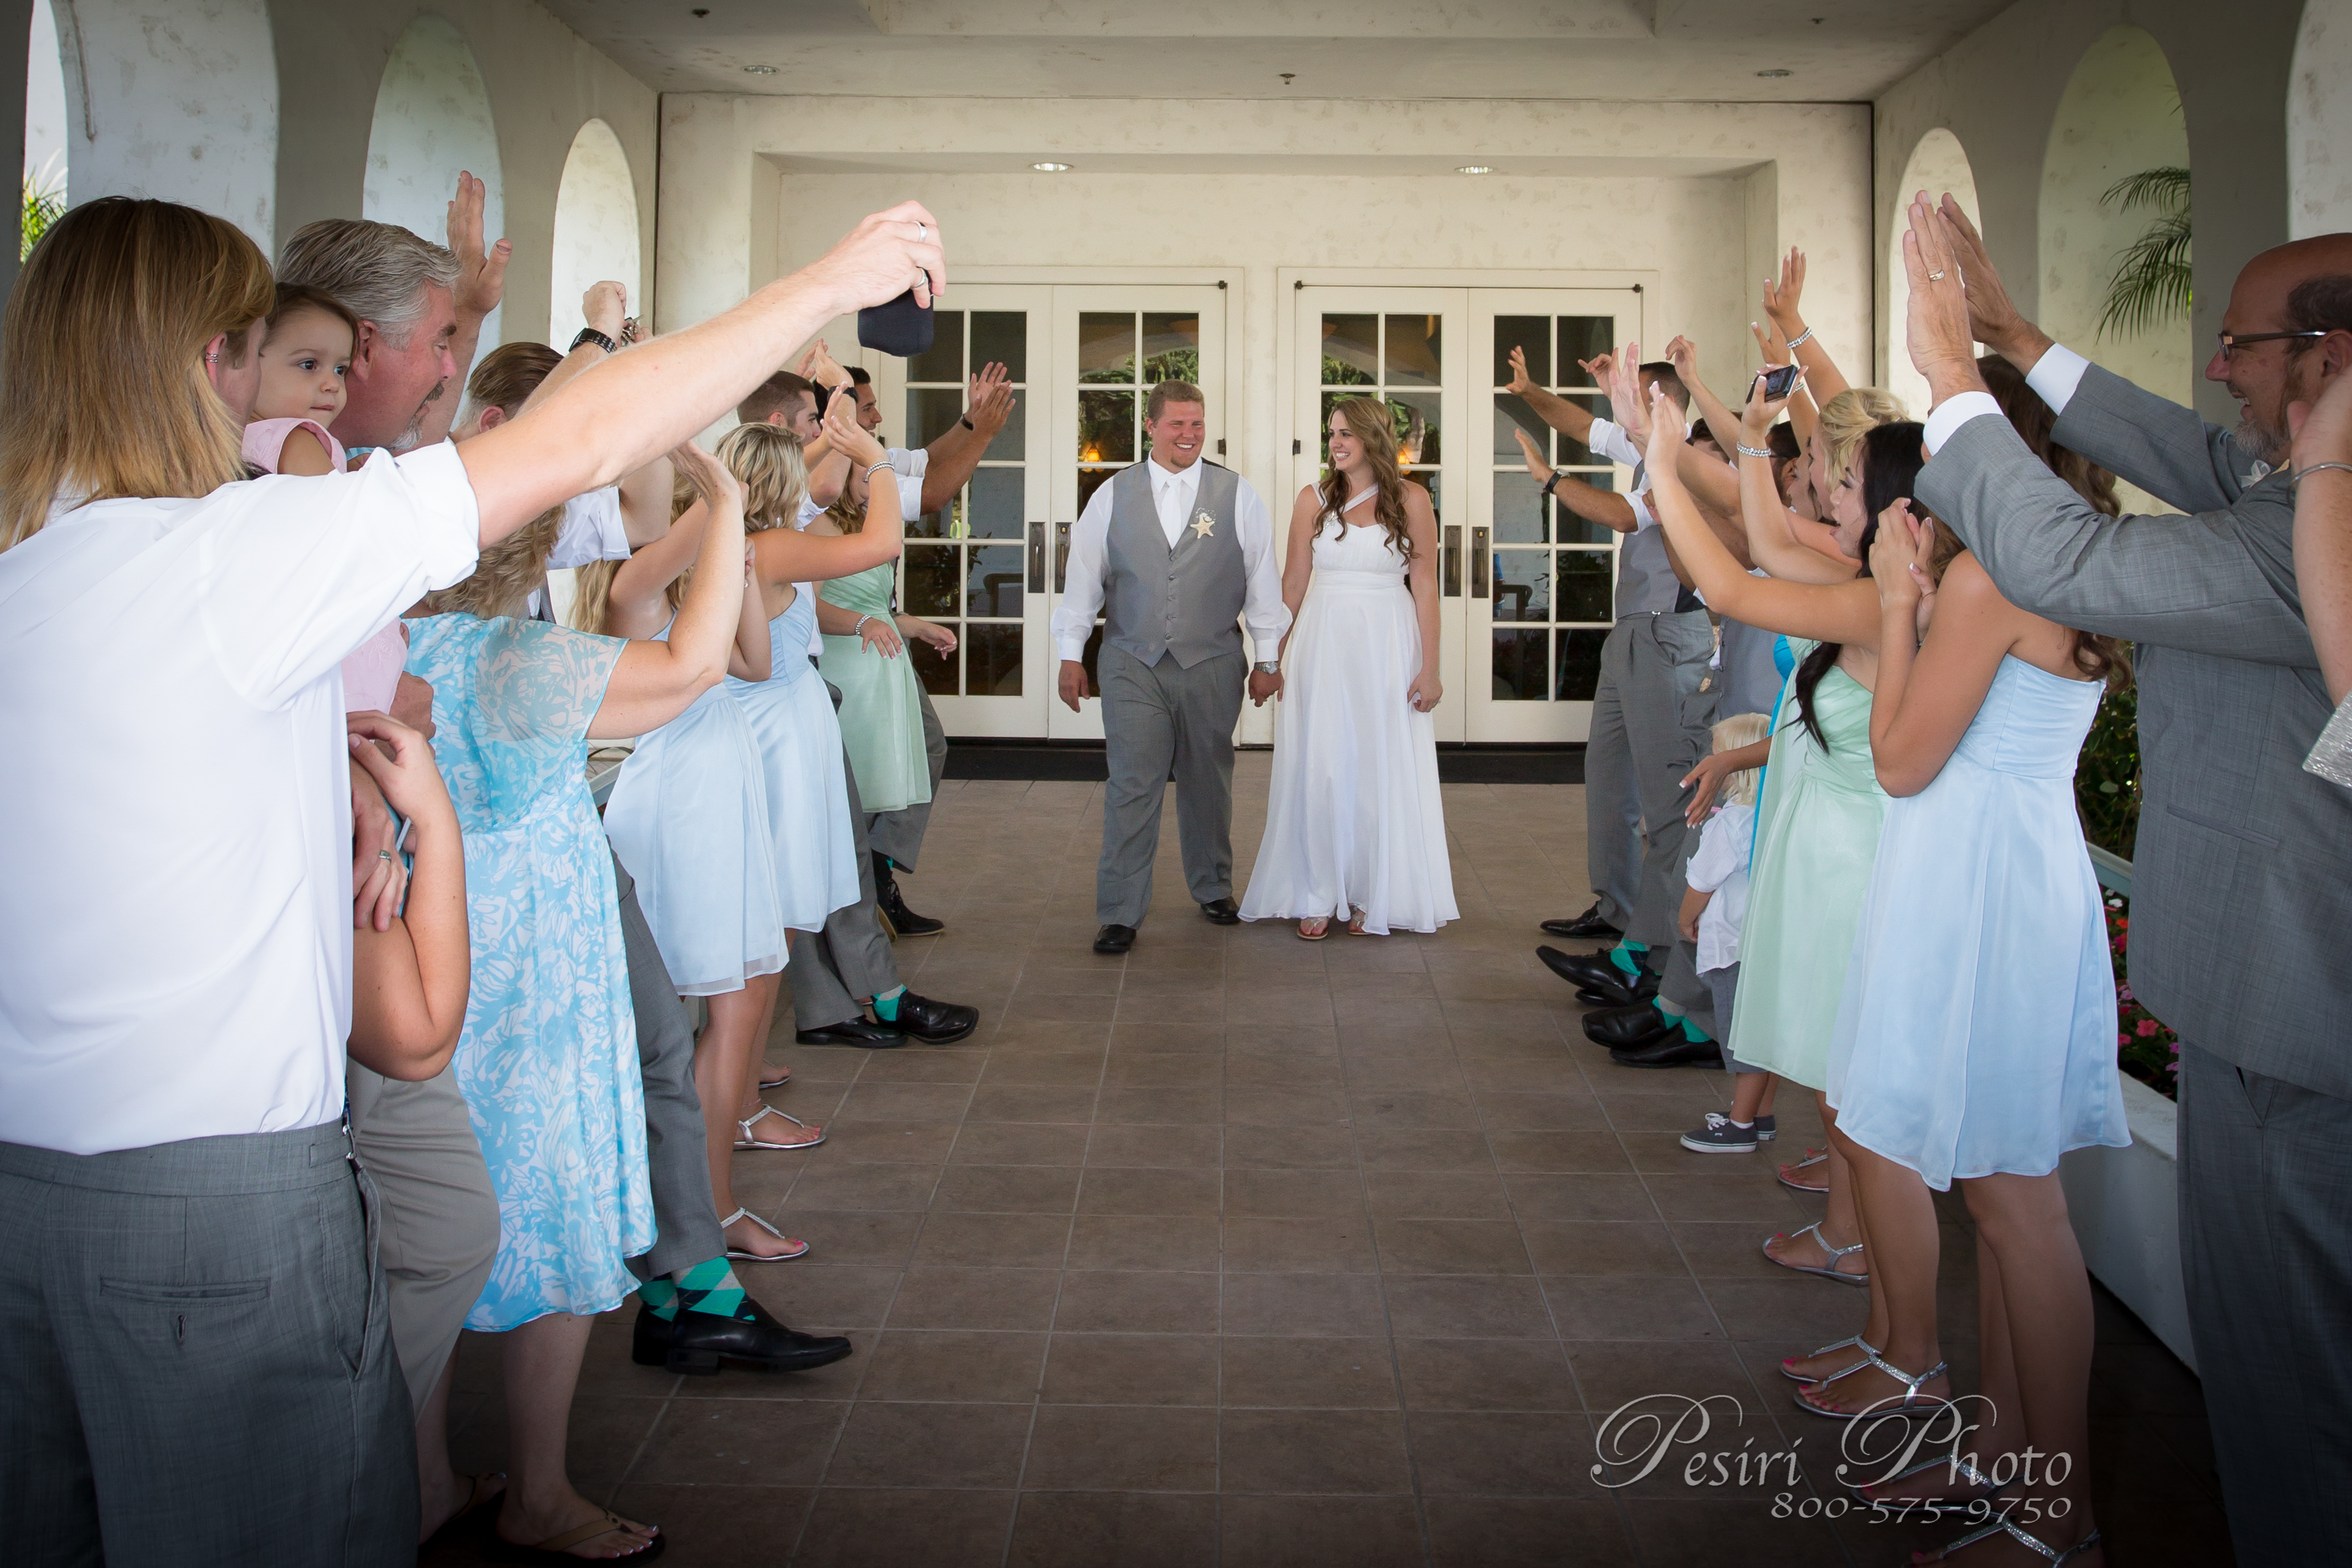 Los Coyotes weddings By Pesiri Photo A-114